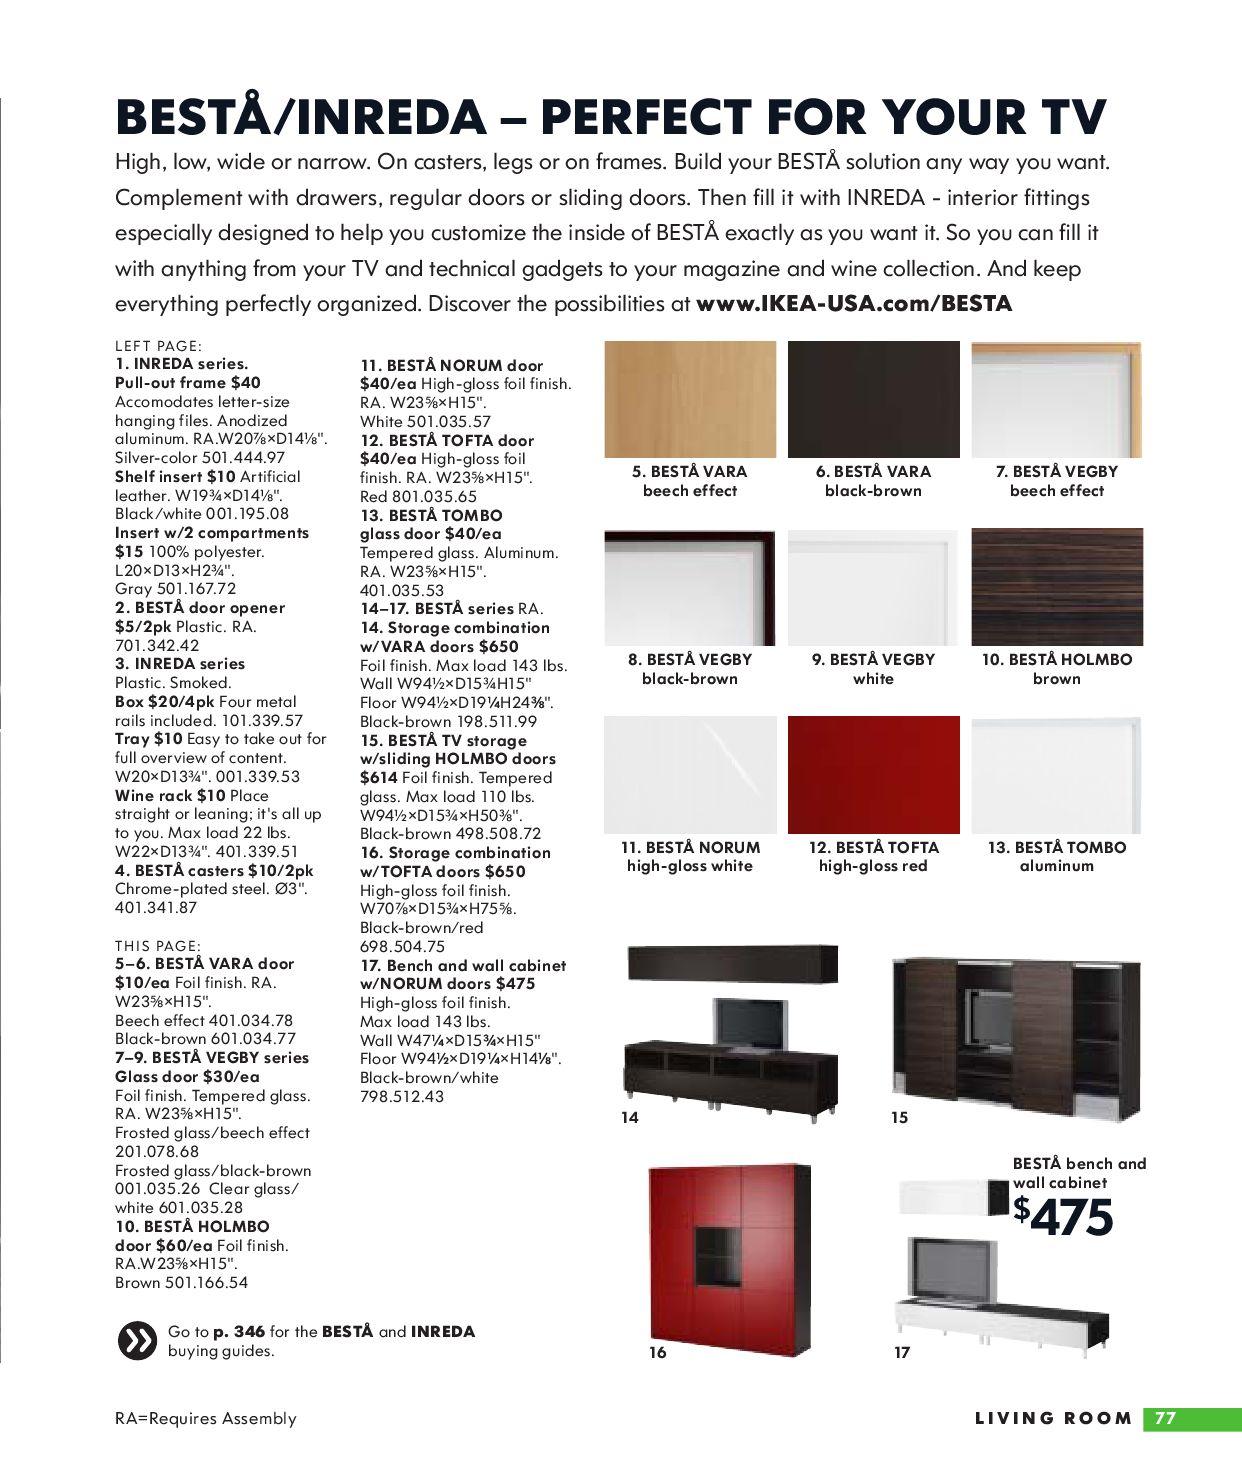 Ikea Catalogue 2009 ikea 2009 cataloguemuhammad mansour - issuu